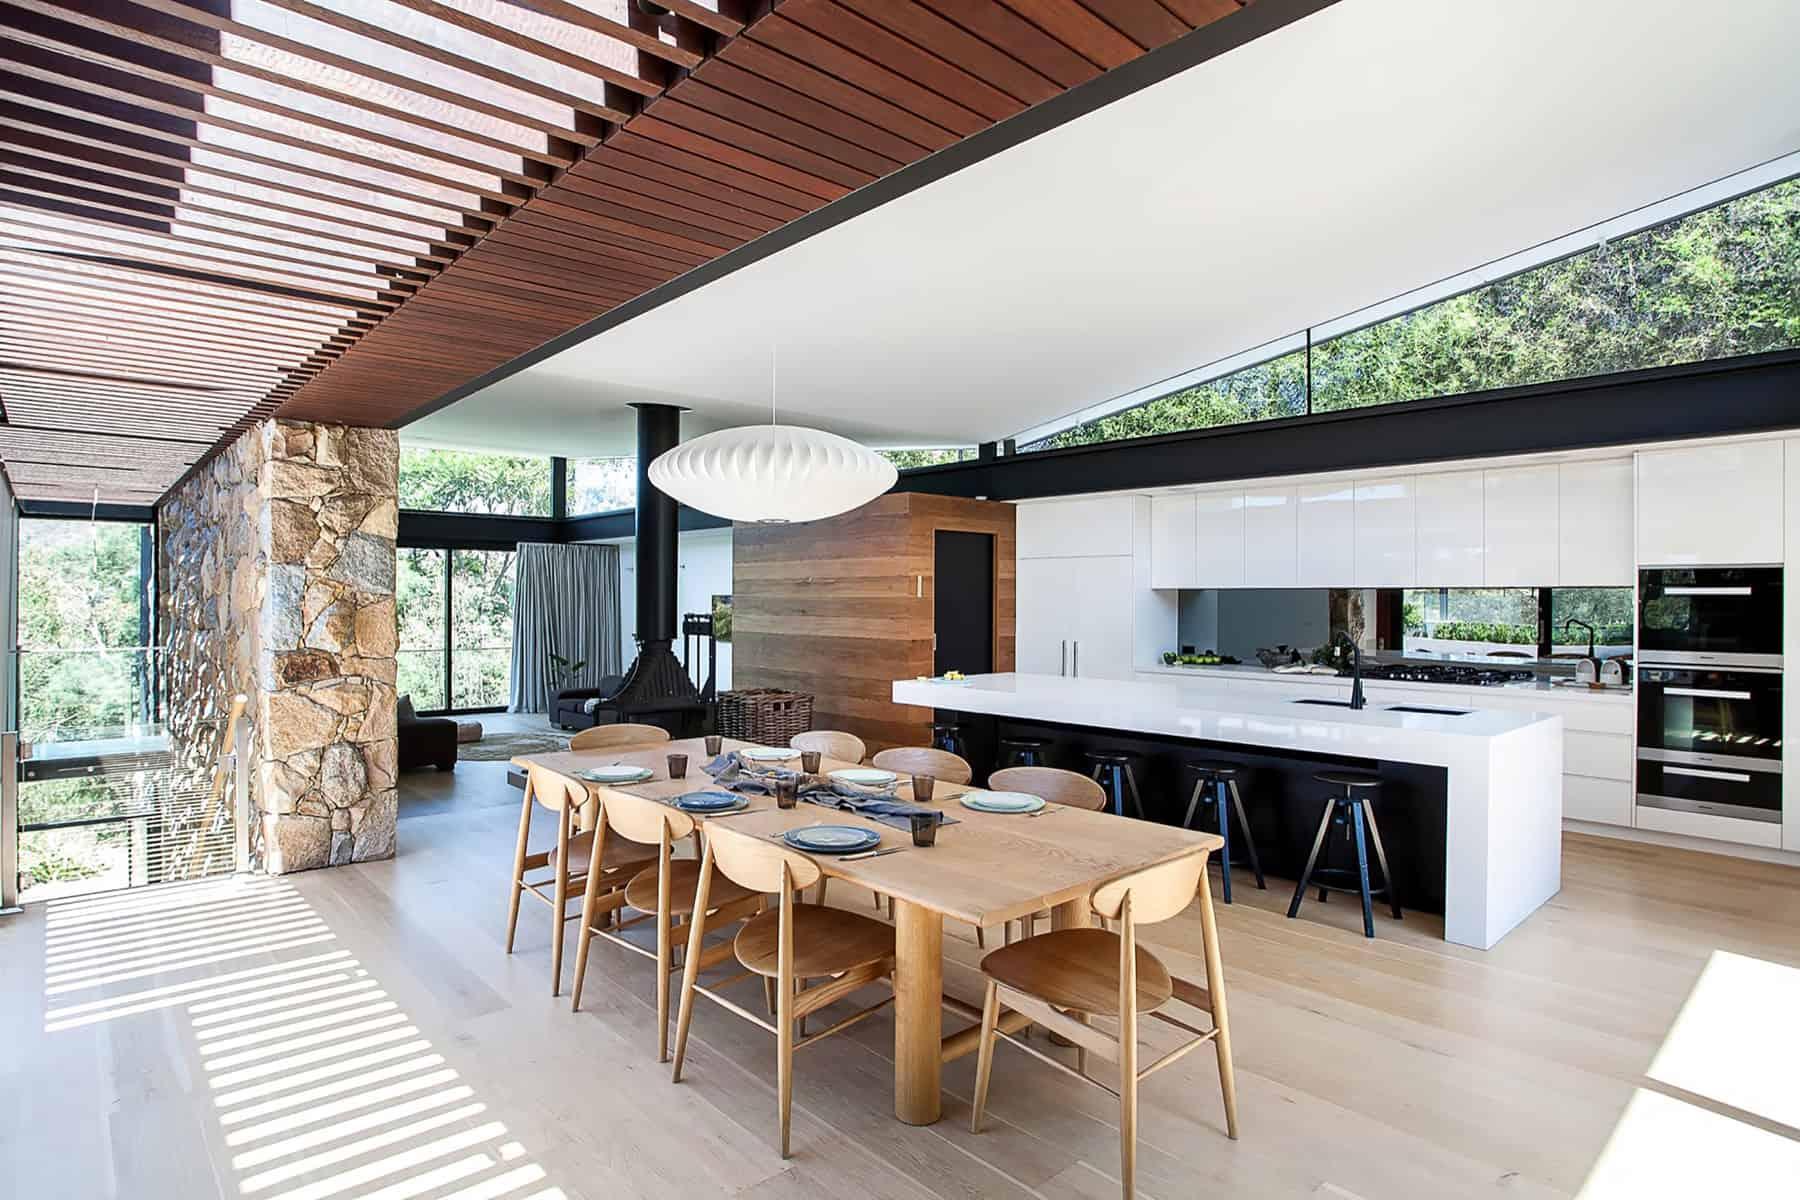 Alexandra Buchanan Architecture Designs a Spacious Contemporary Home in Melbourne, Australia